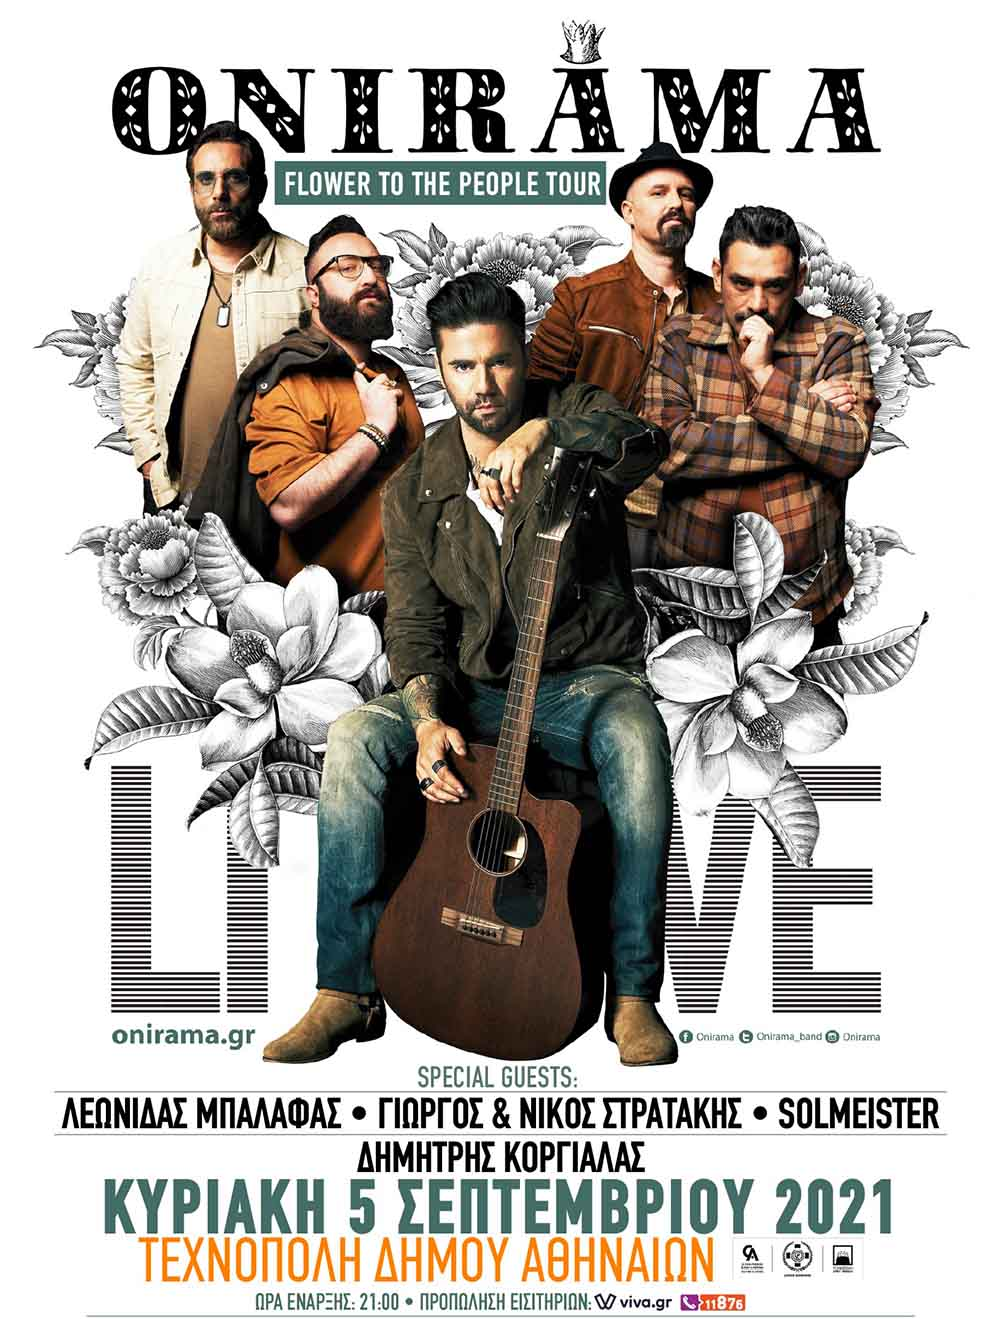 Onirama: Επετειακό Album & Μεγάλη Συναυλία στη Τεχνόπολη